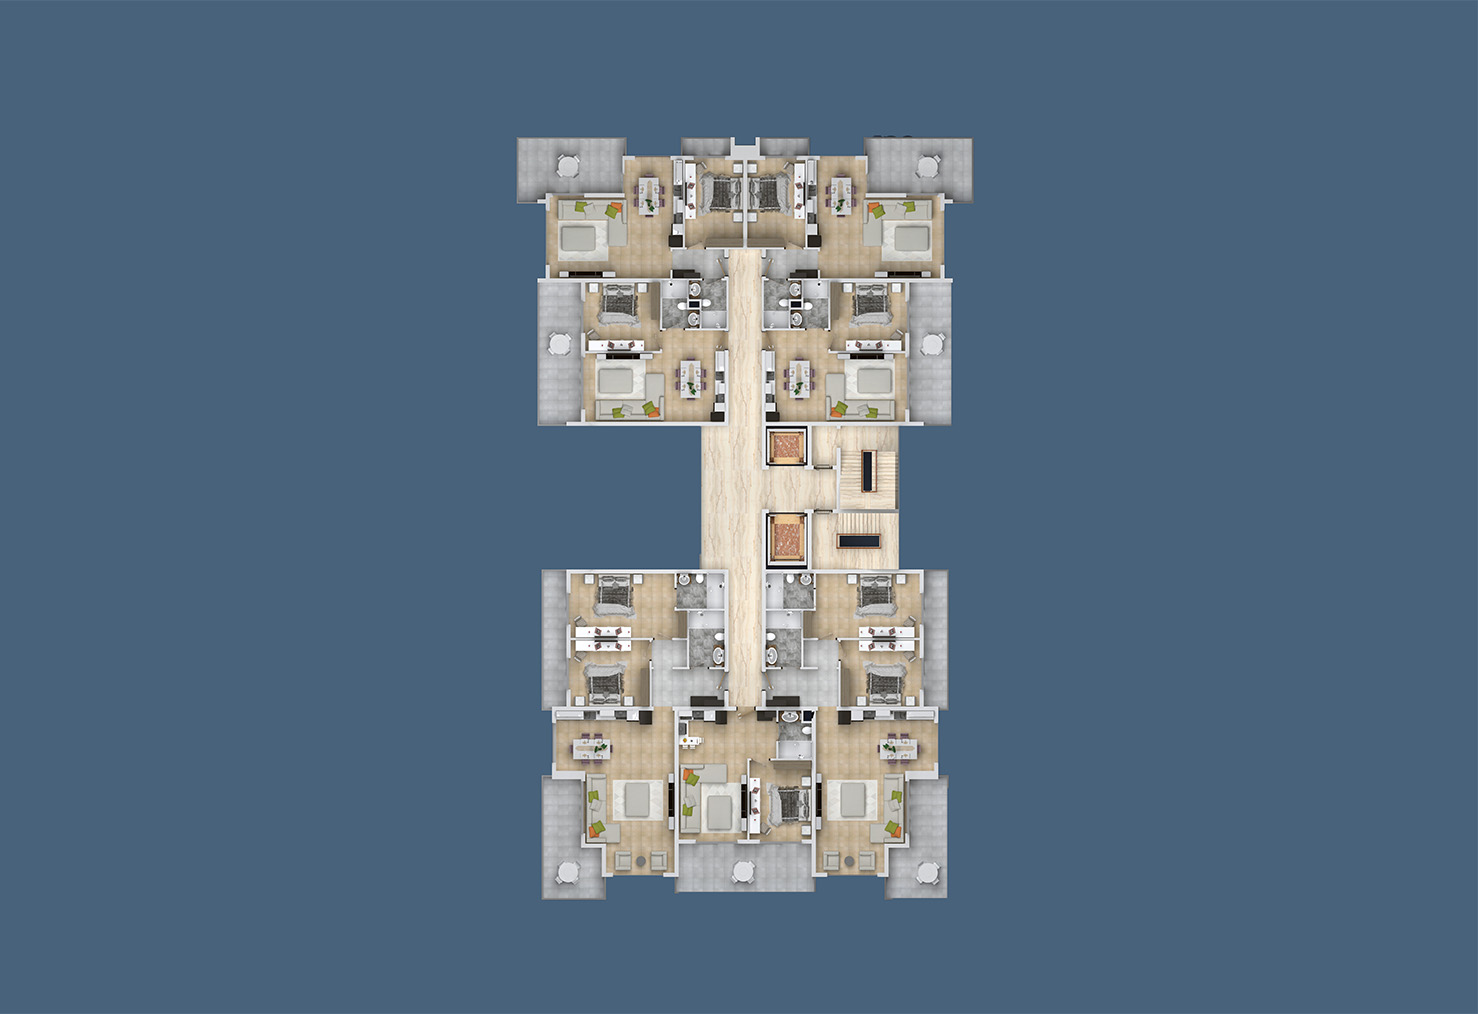 План расположения квартир 3 этаж A Yekta Kingdom Trade Center